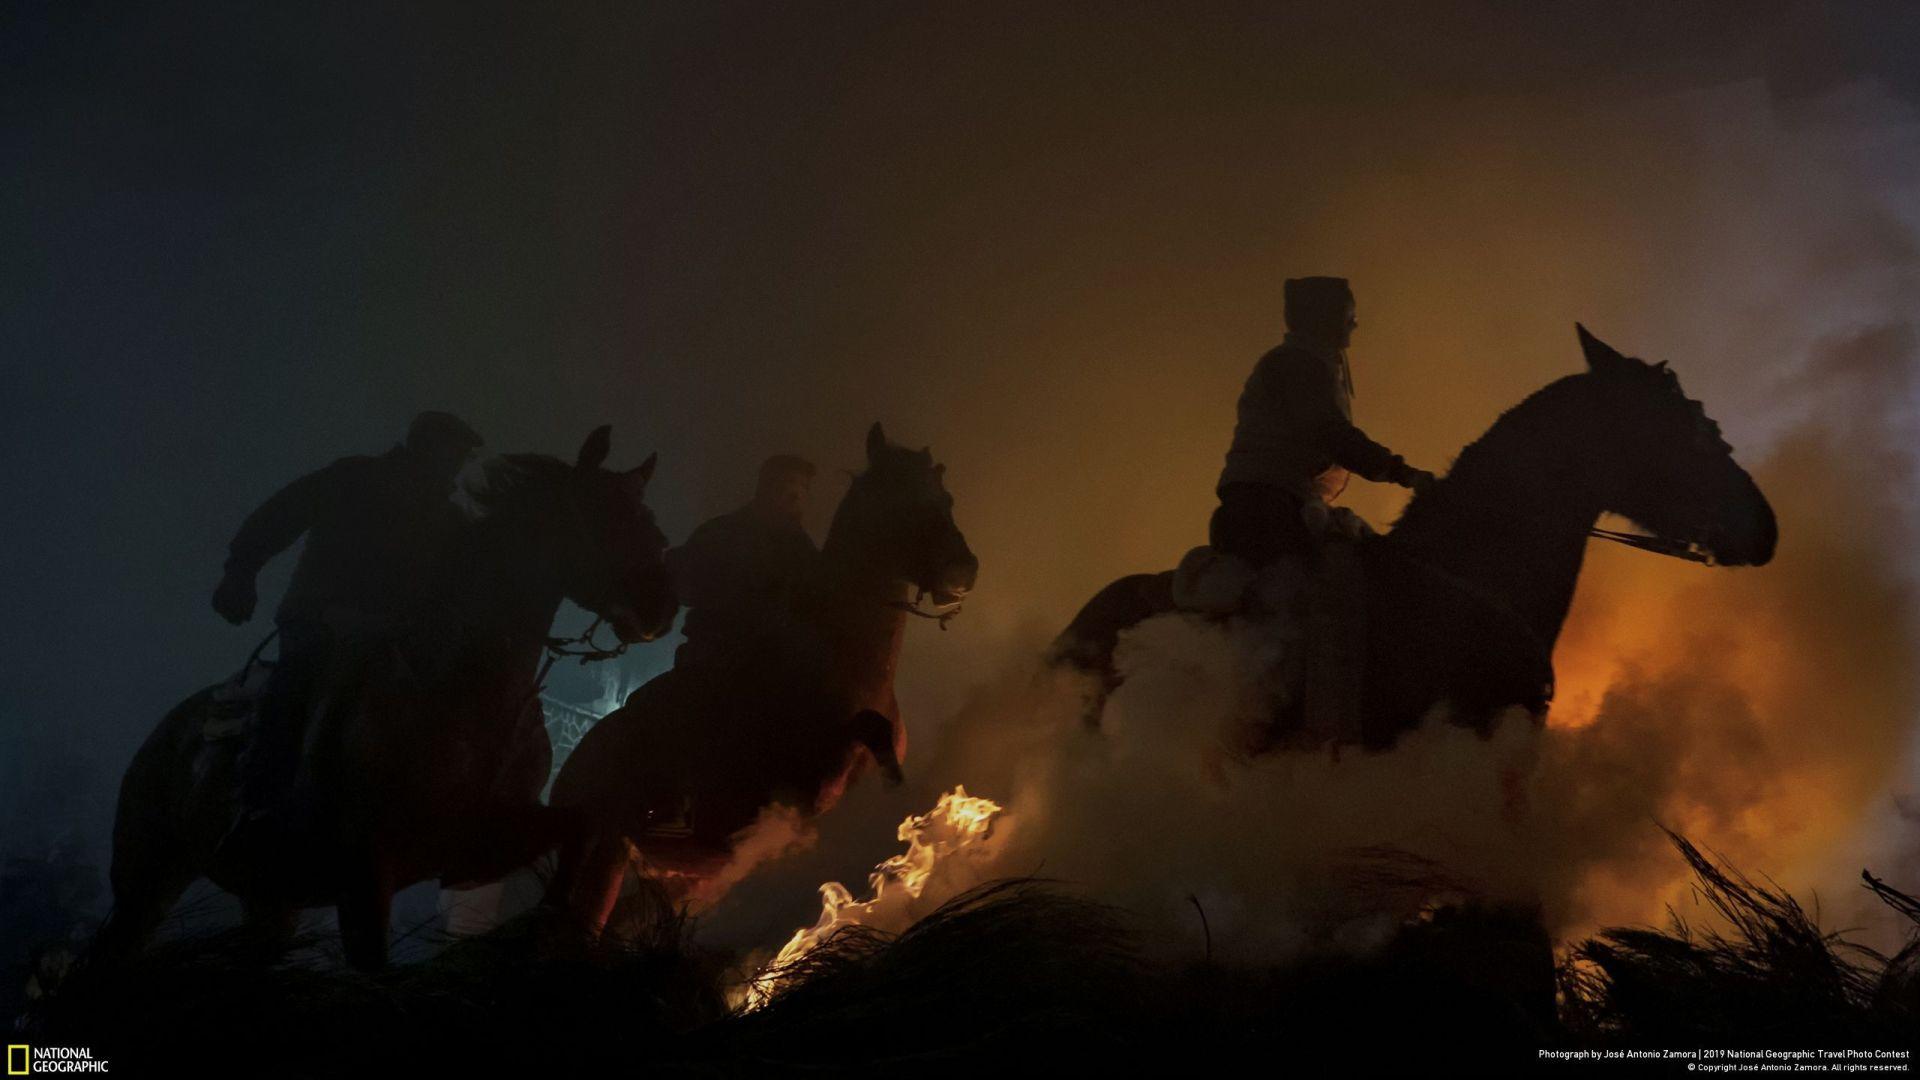 """Коњи"" (Jose Antonio Zamora/Your Shot/National Geographic) - трето место во категорија ""Луѓе"""